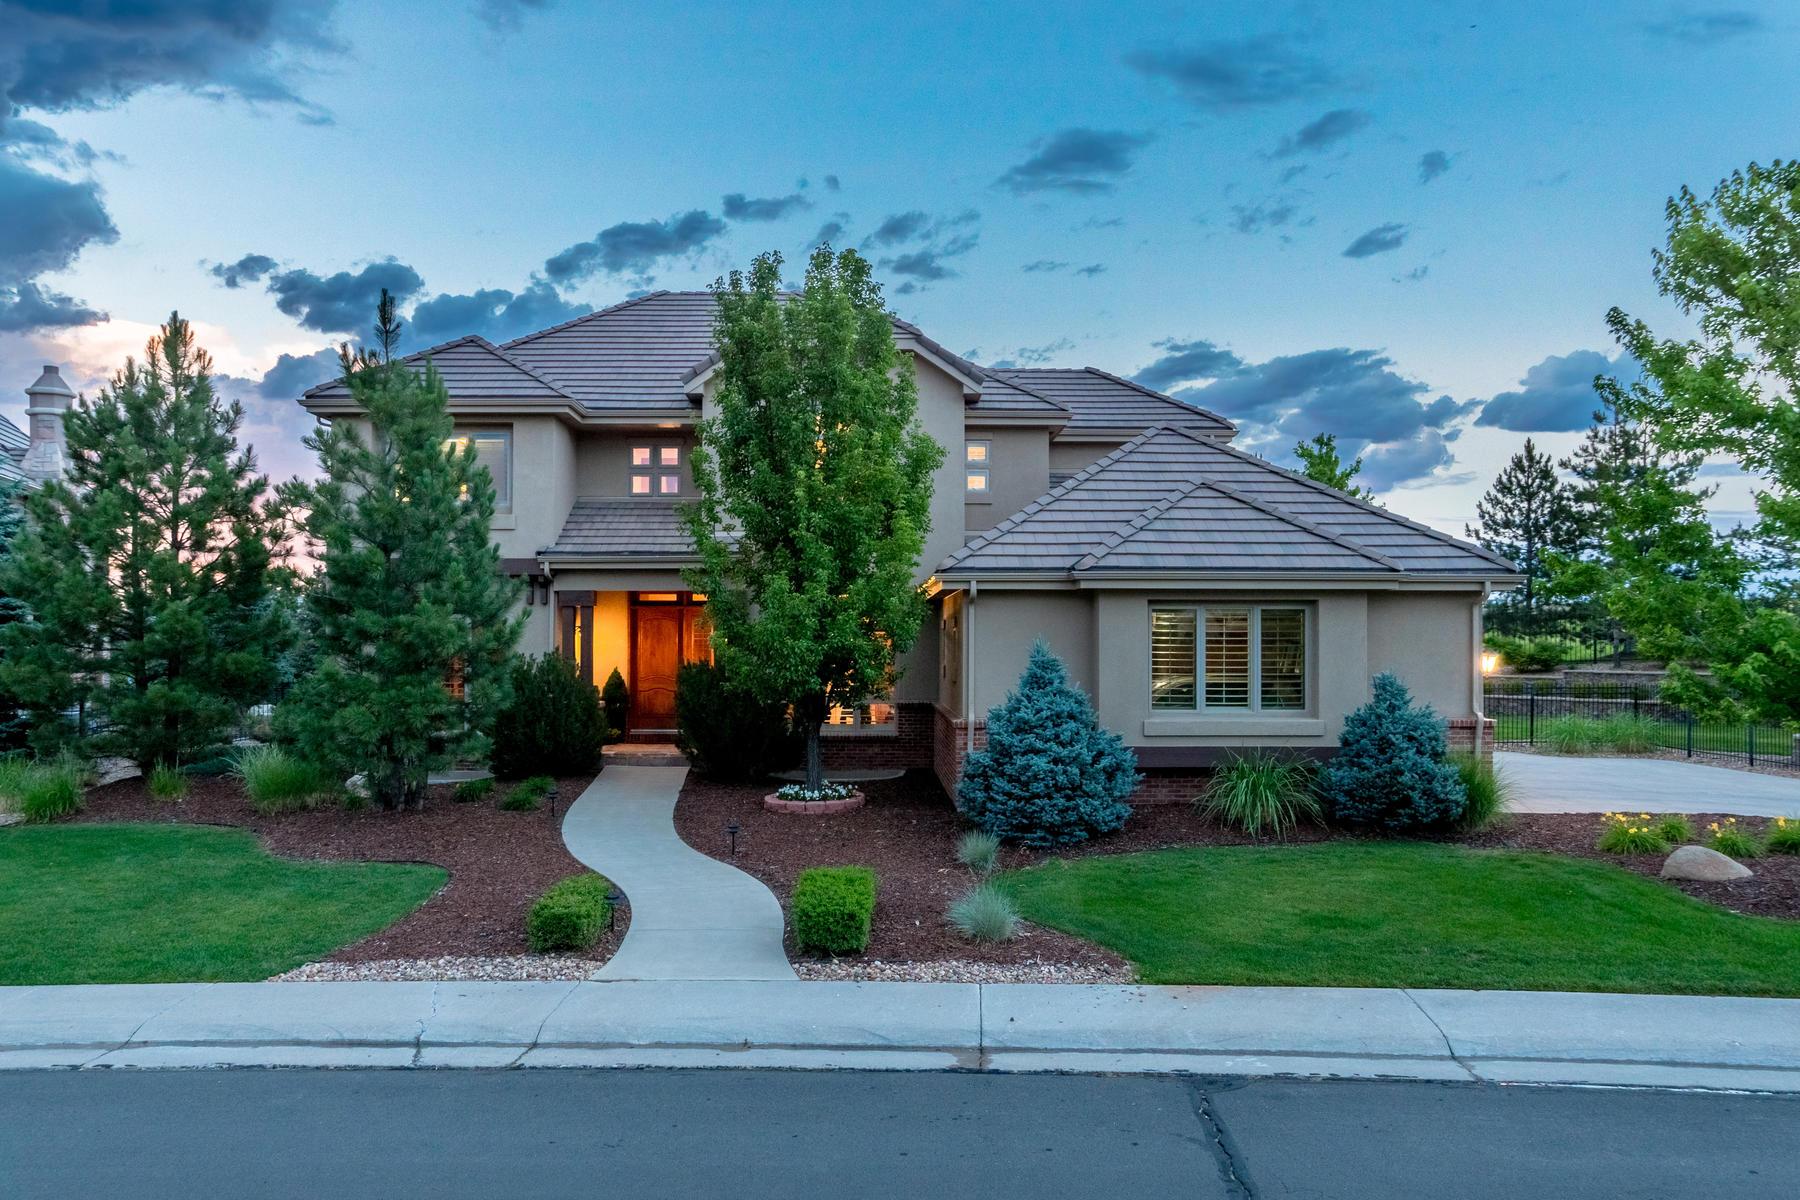 独户住宅 为 销售 在 Welcome to the backyard oasis of your dreams 10258 Dowling Way 伊恩和高原牧场, 科罗拉多州, 80126 美国